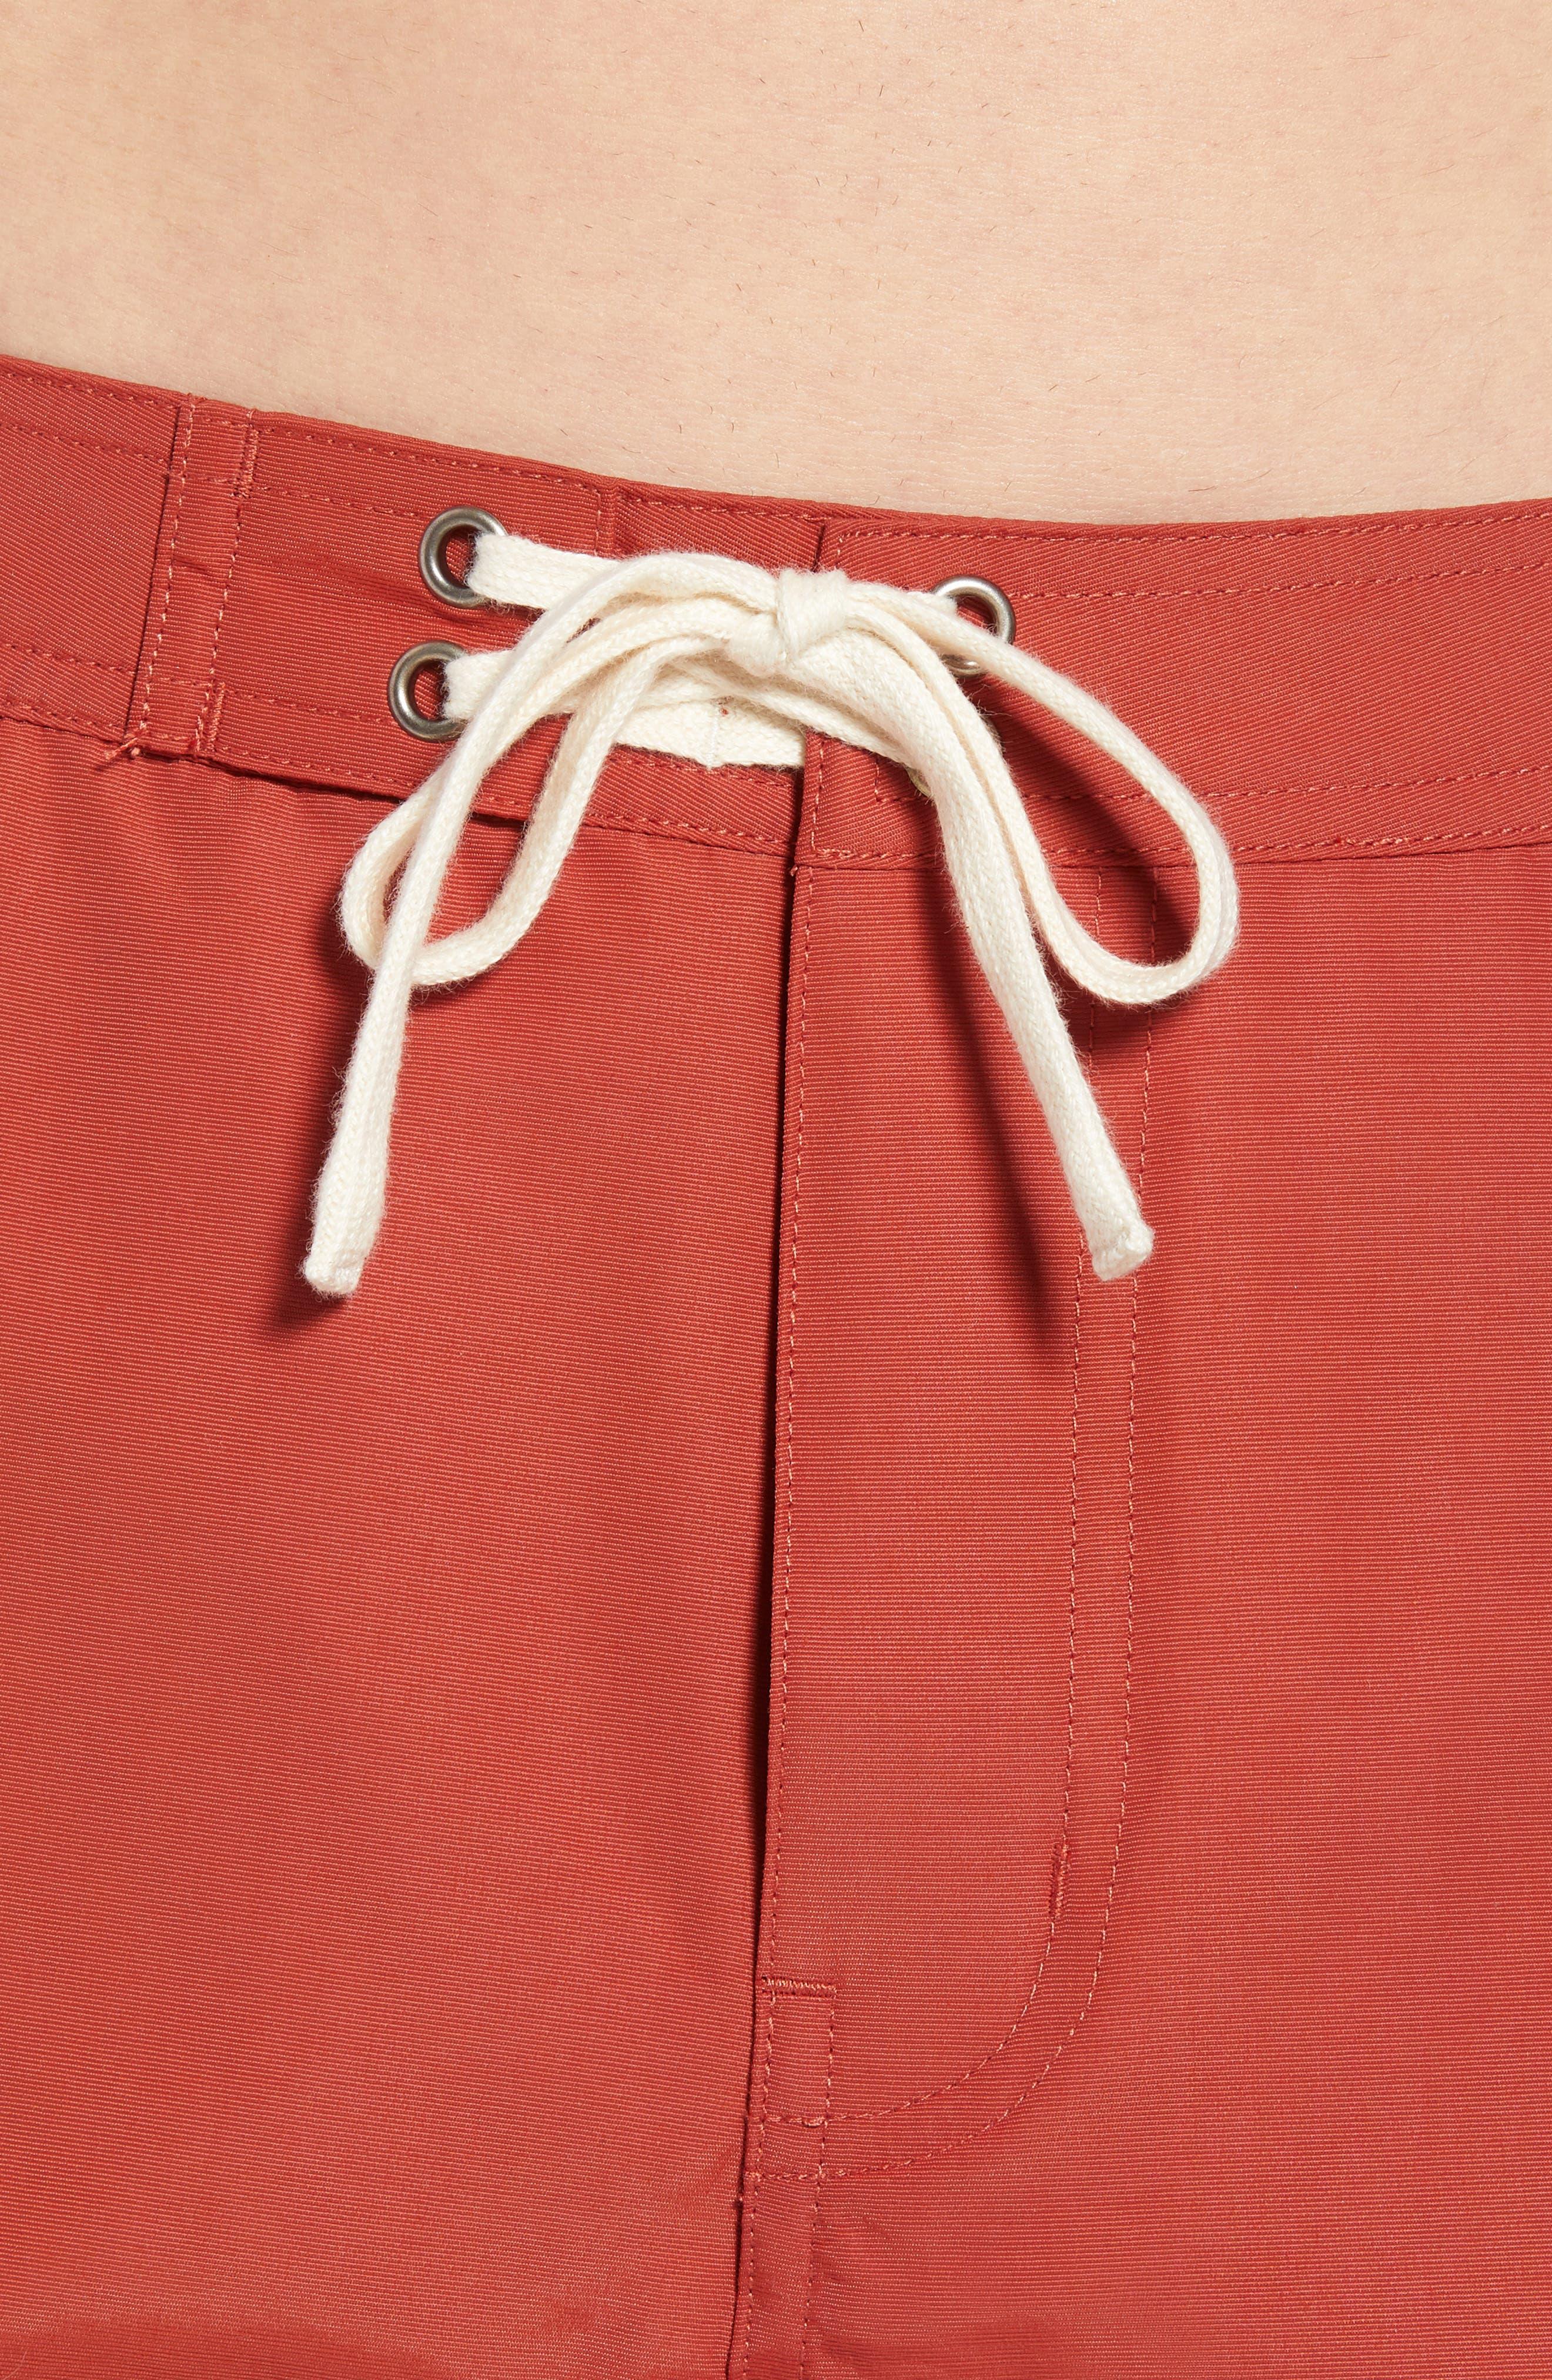 Colin Board Shorts,                             Alternate thumbnail 4, color,                             600